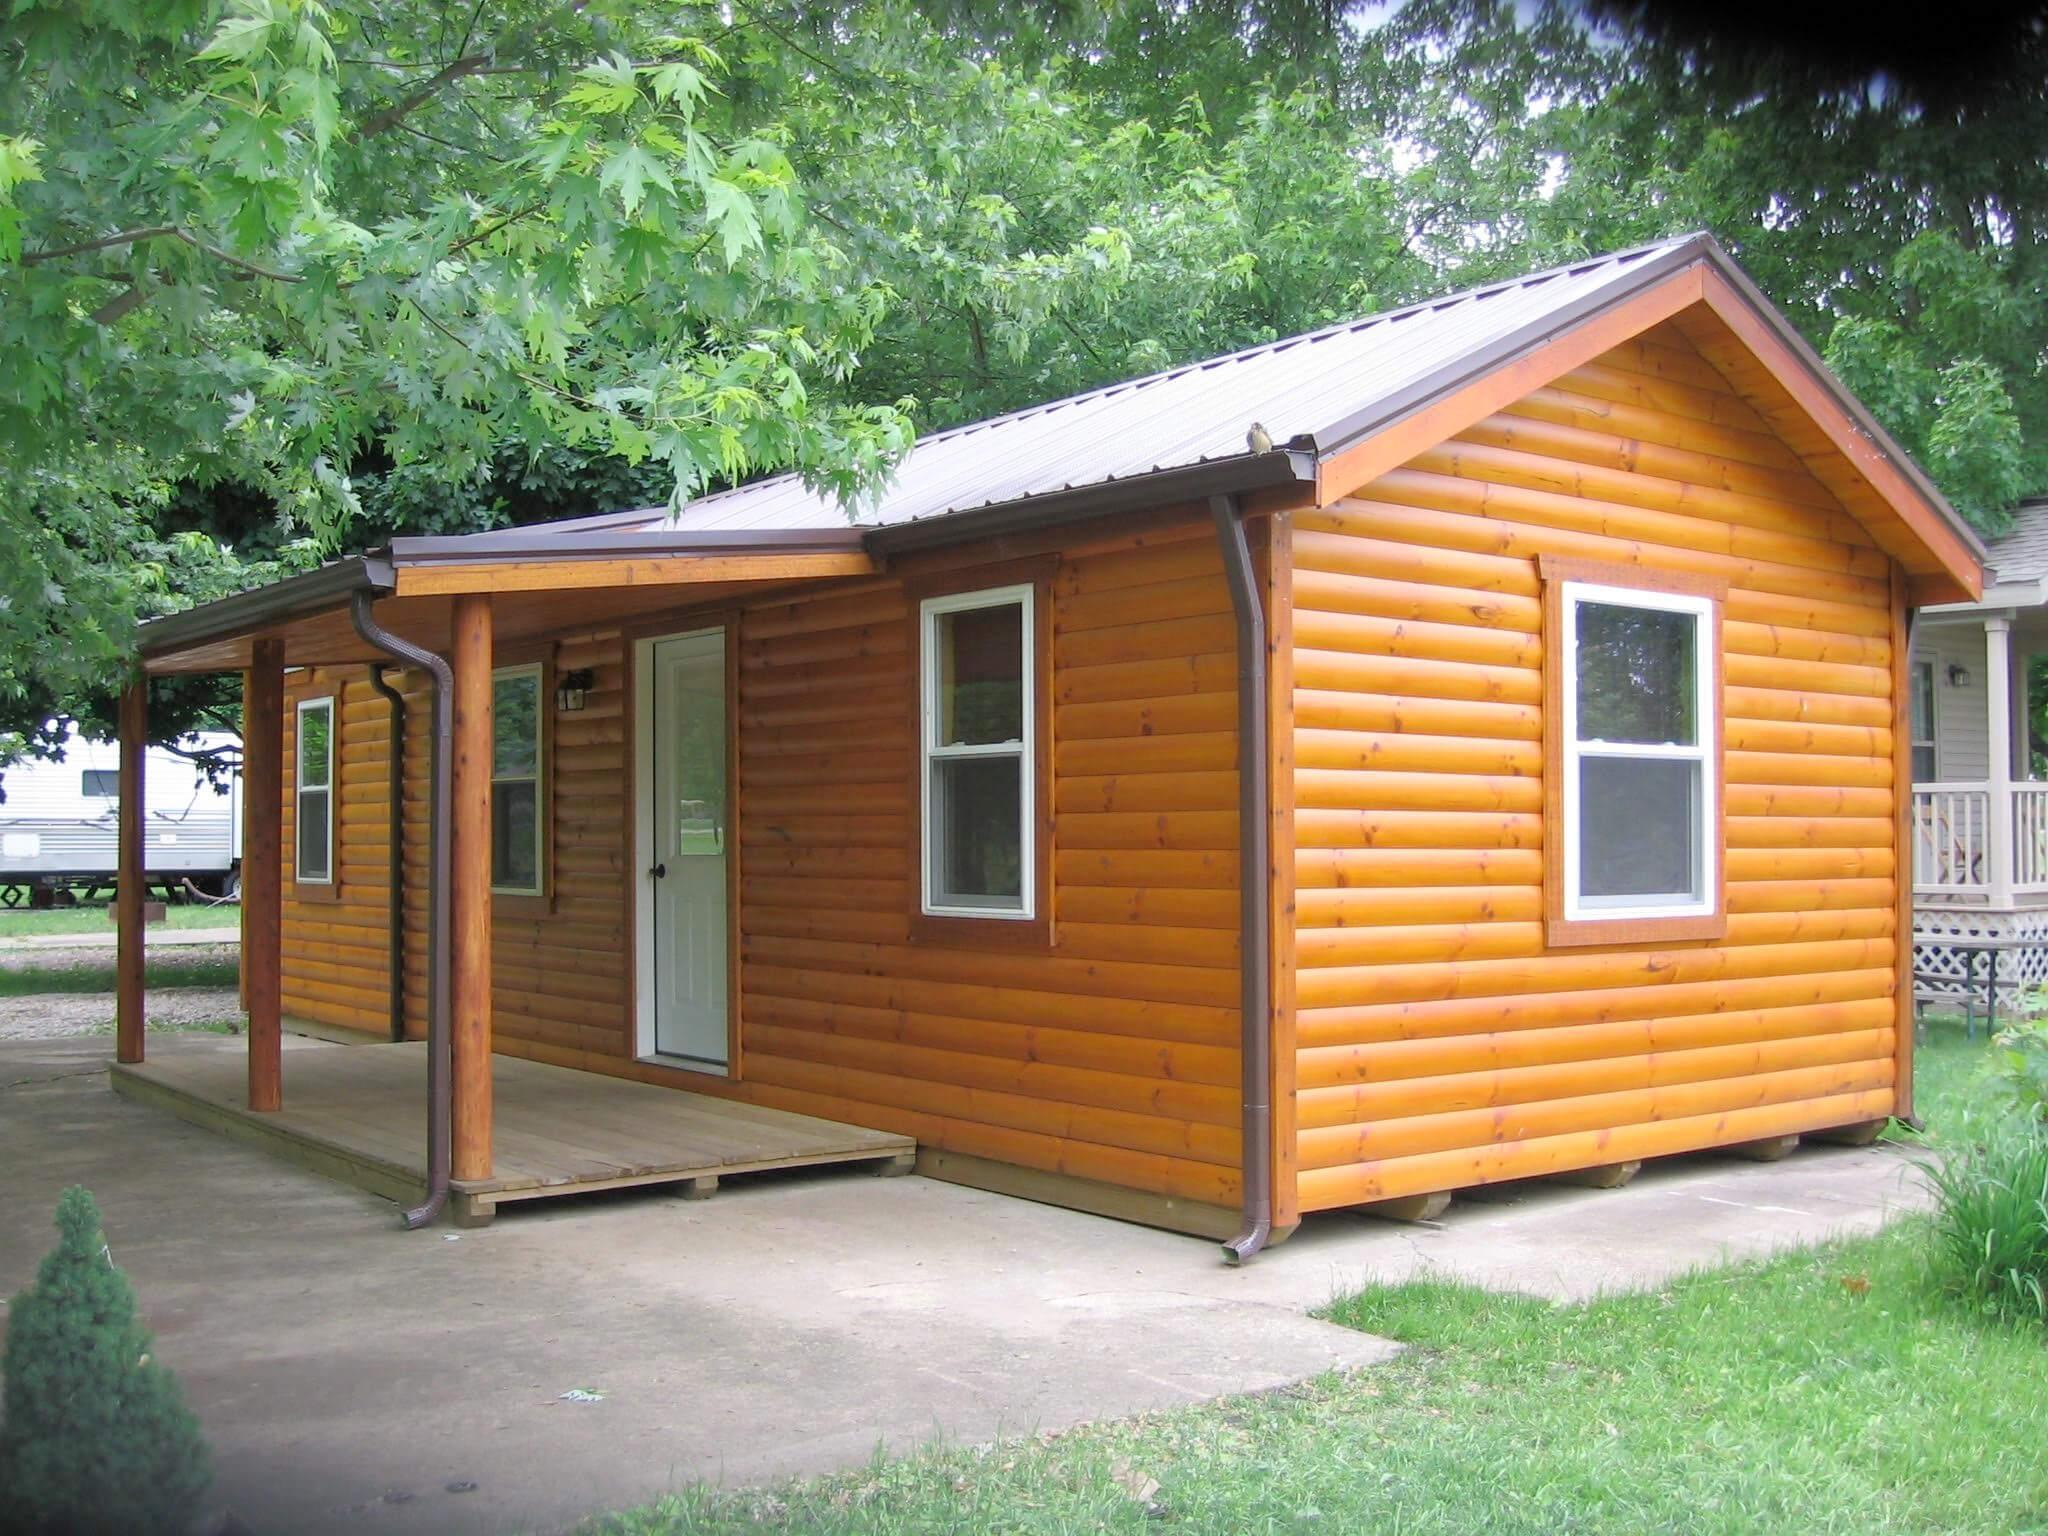 Mb2391 x c cabins